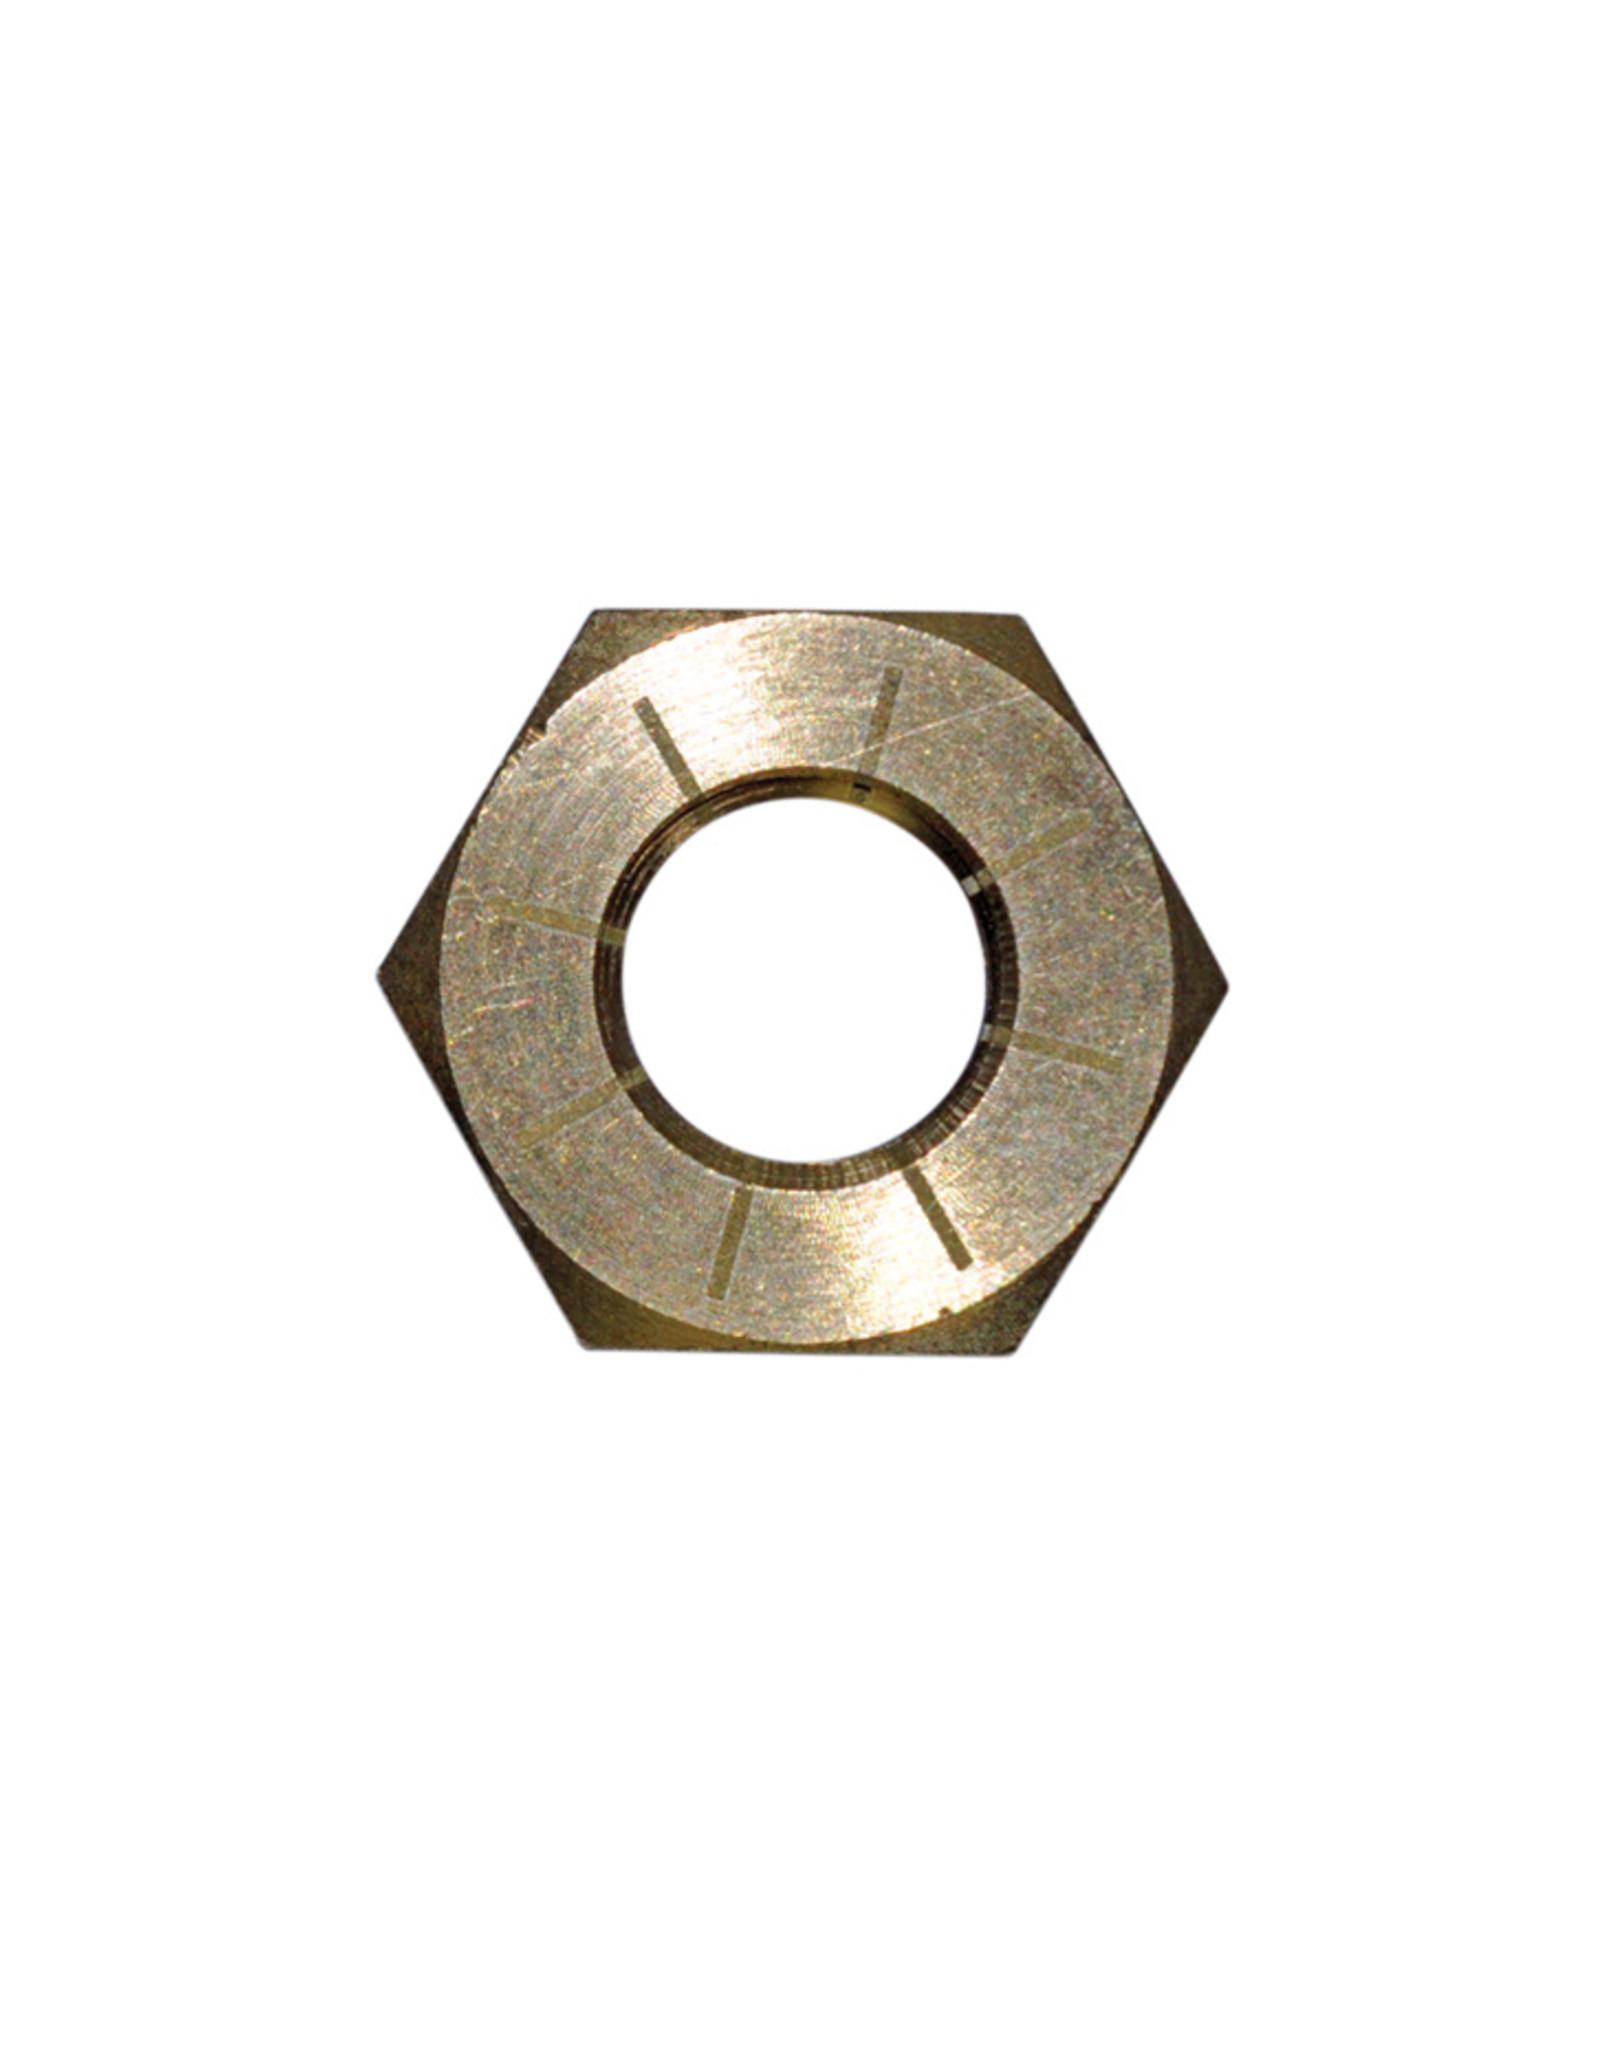 Atom Atom Pilot Falcon King Pin Gold Nut